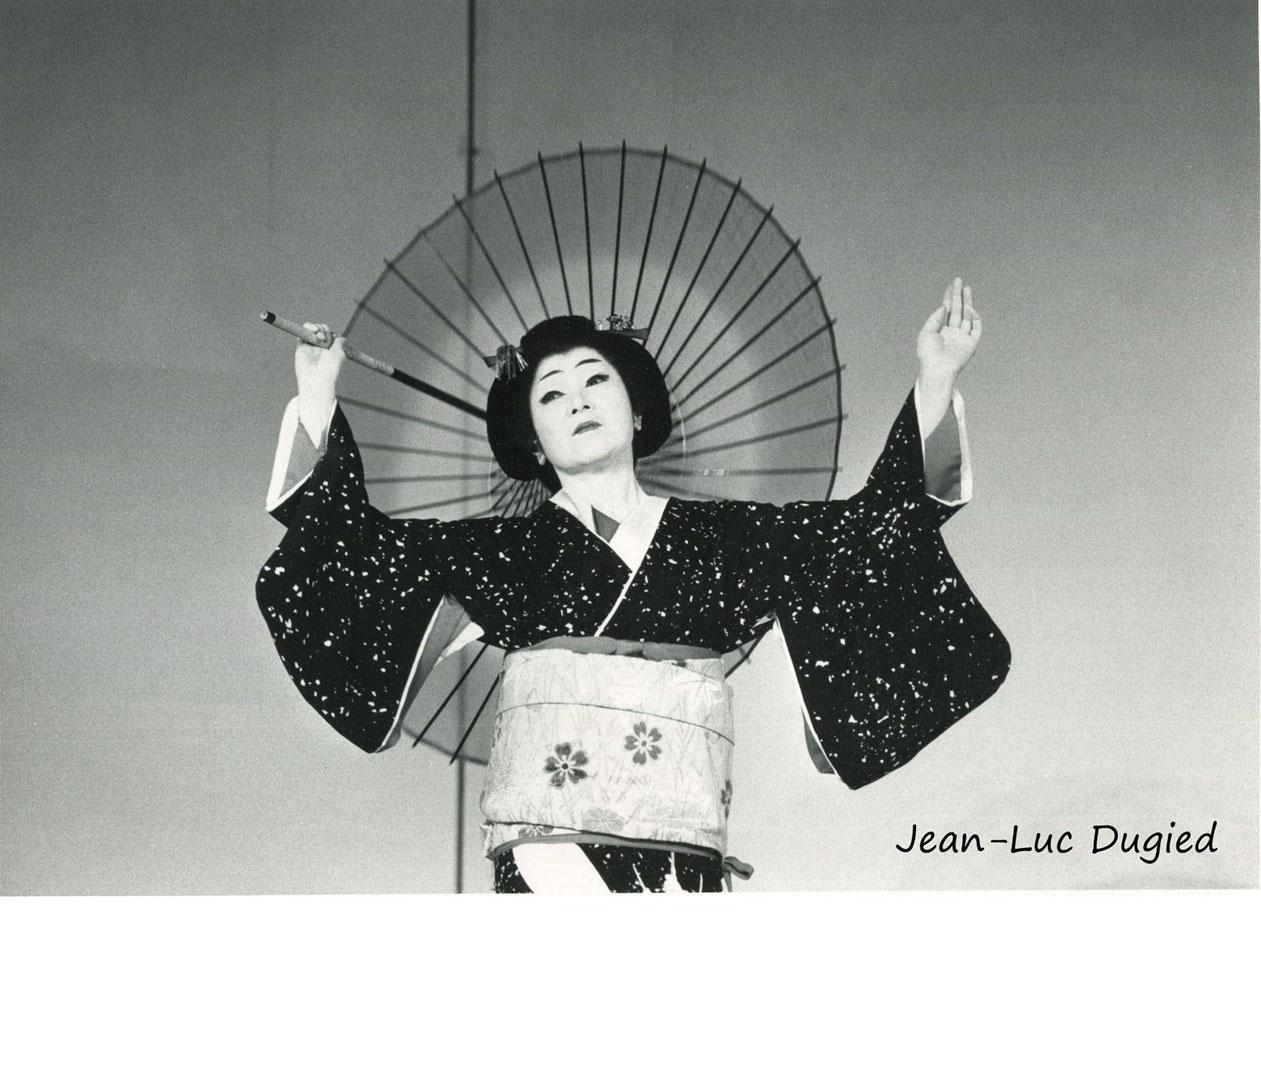 35 Kanzaki Hidejo - yuki (neige) - jiuta mai - 1986